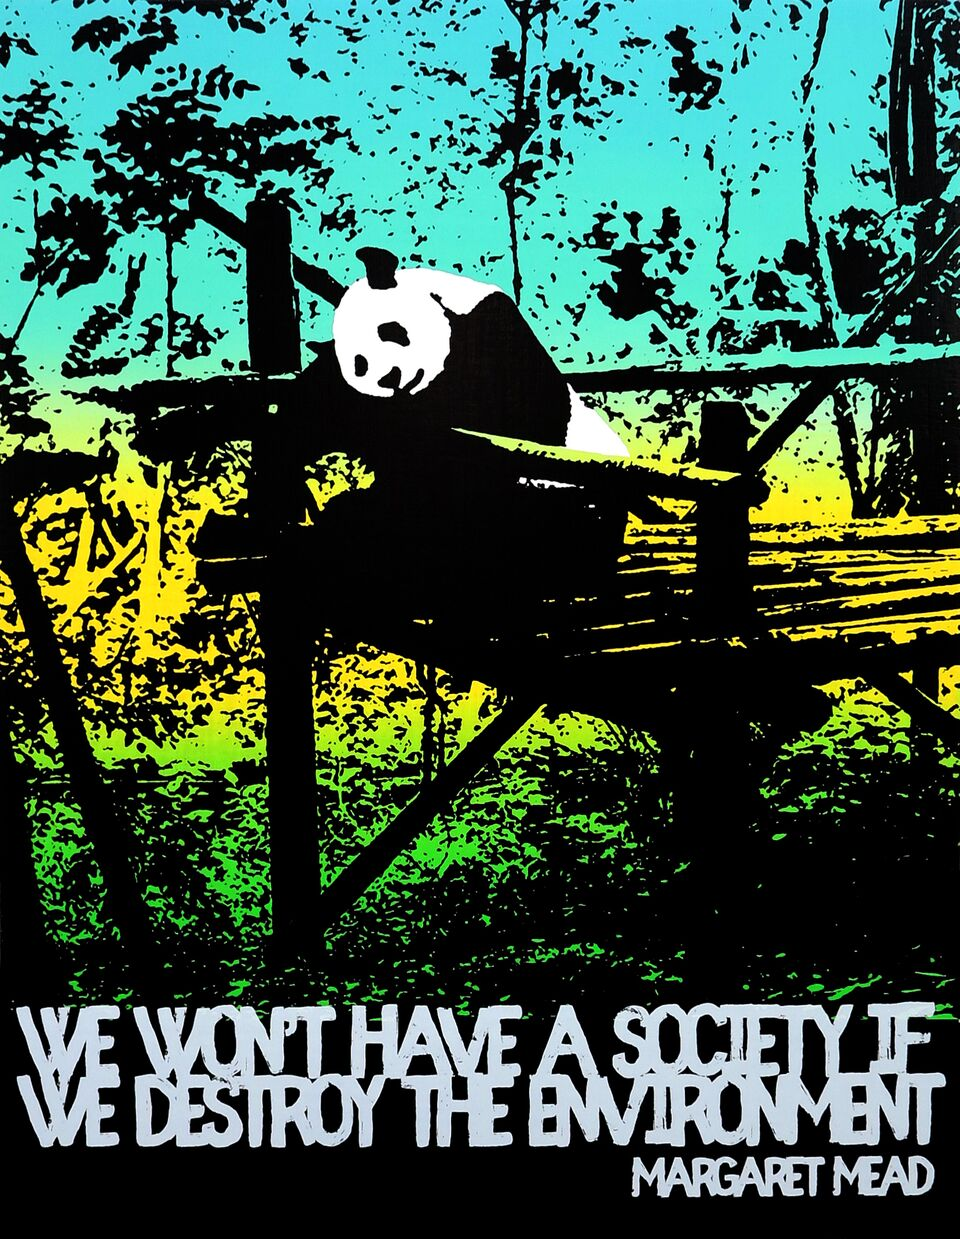 Motivational Panda (Margaret Mead)